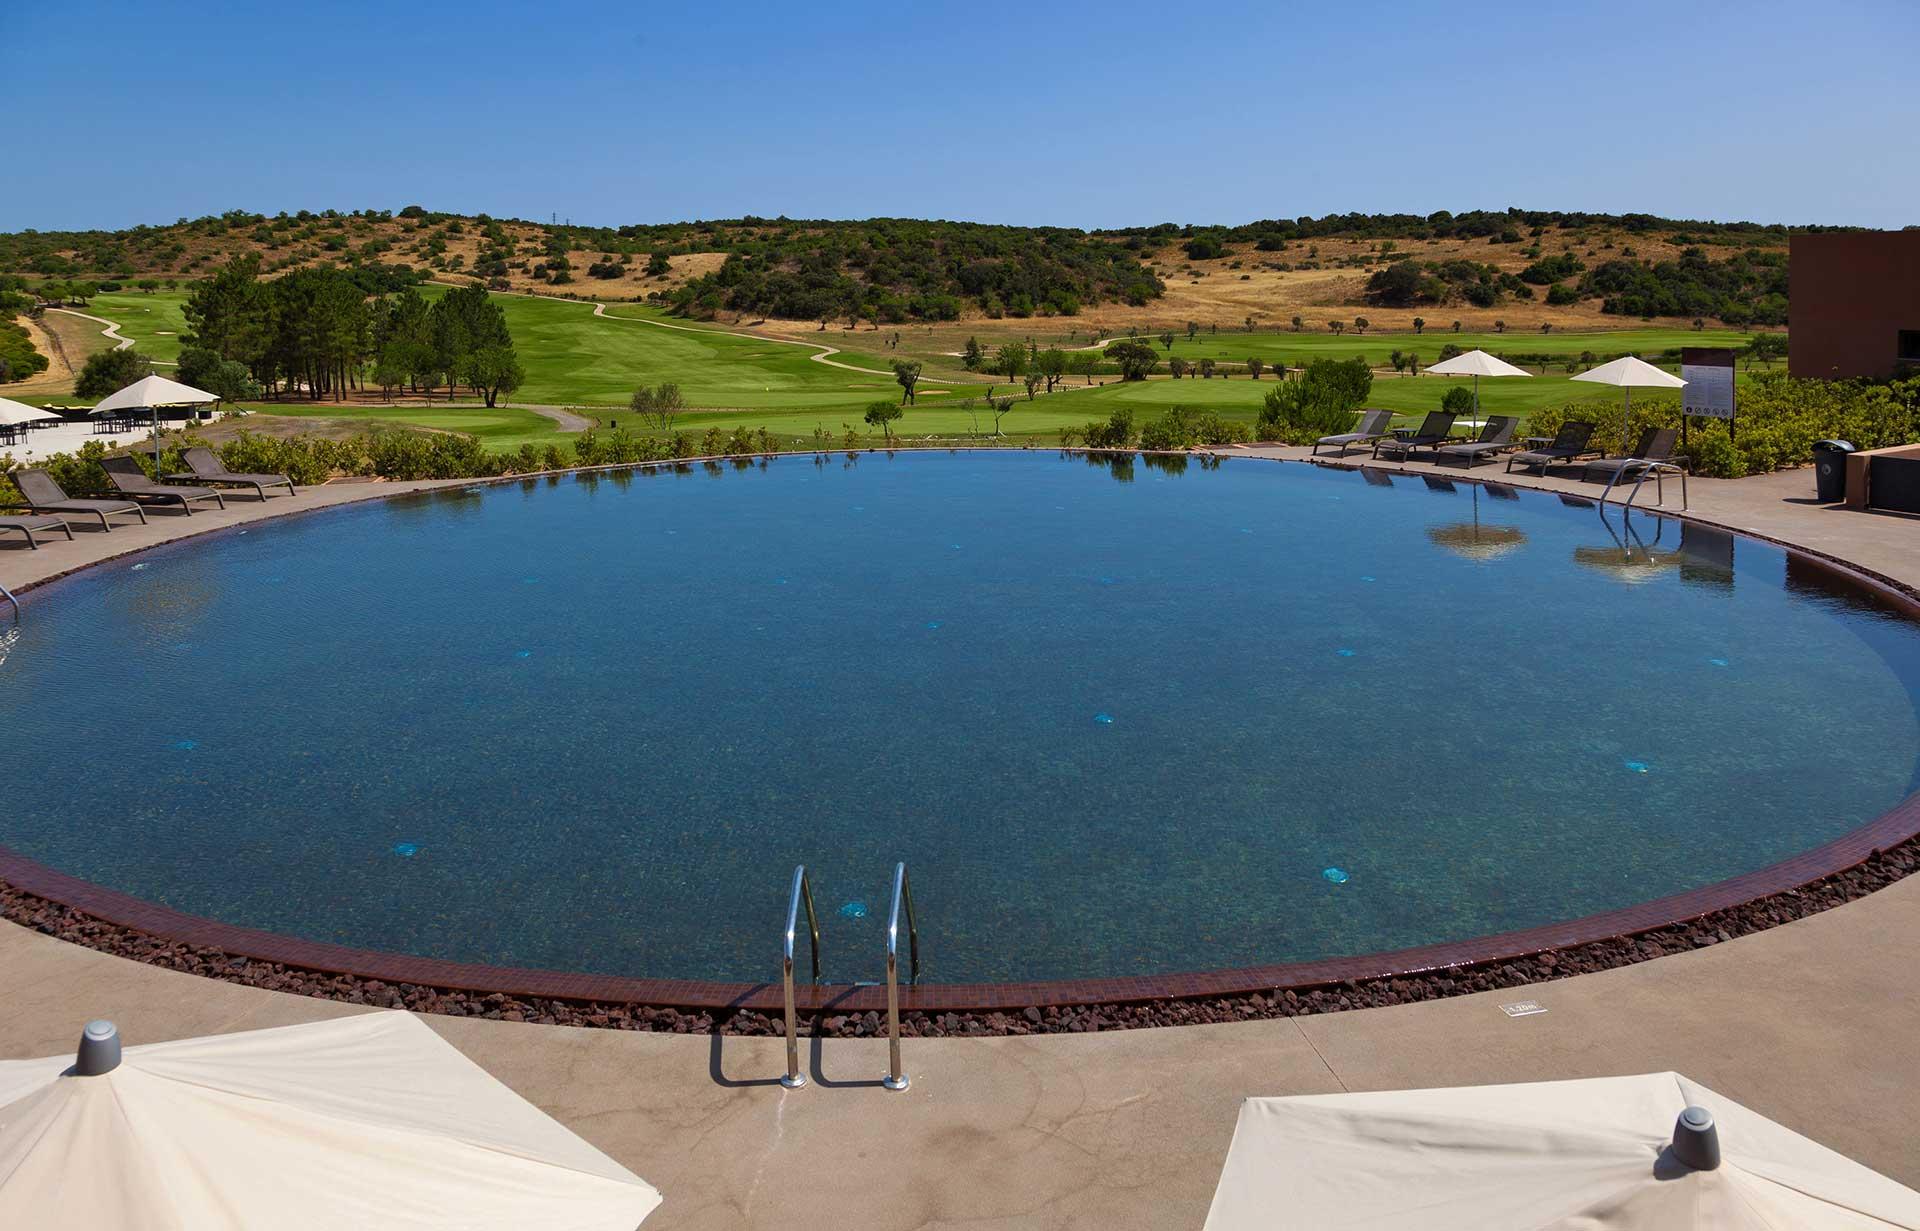 Golf-expedition-golfreizen-golfresort-Morgado-Golf-&-Country-Club-oval-pool